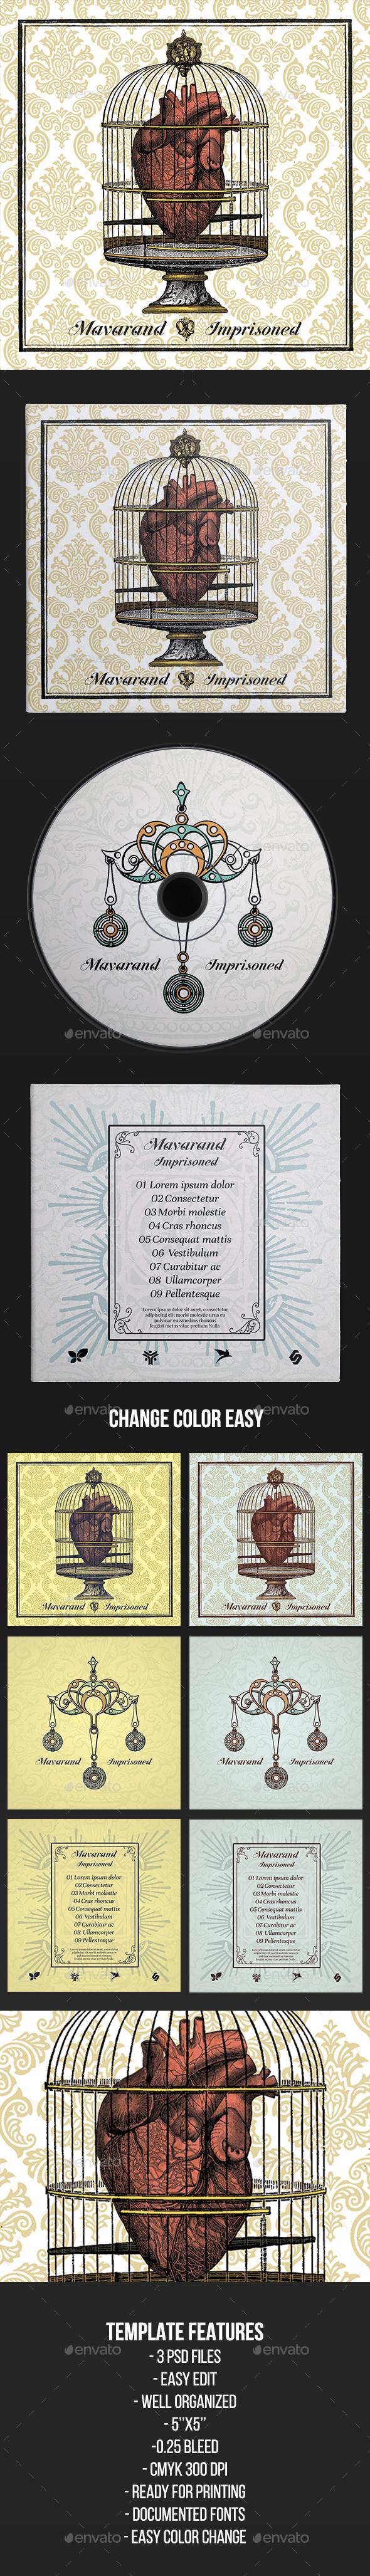 Mavarand - CD Cover Artwork Template - CD & DVD Artwork Print Templates